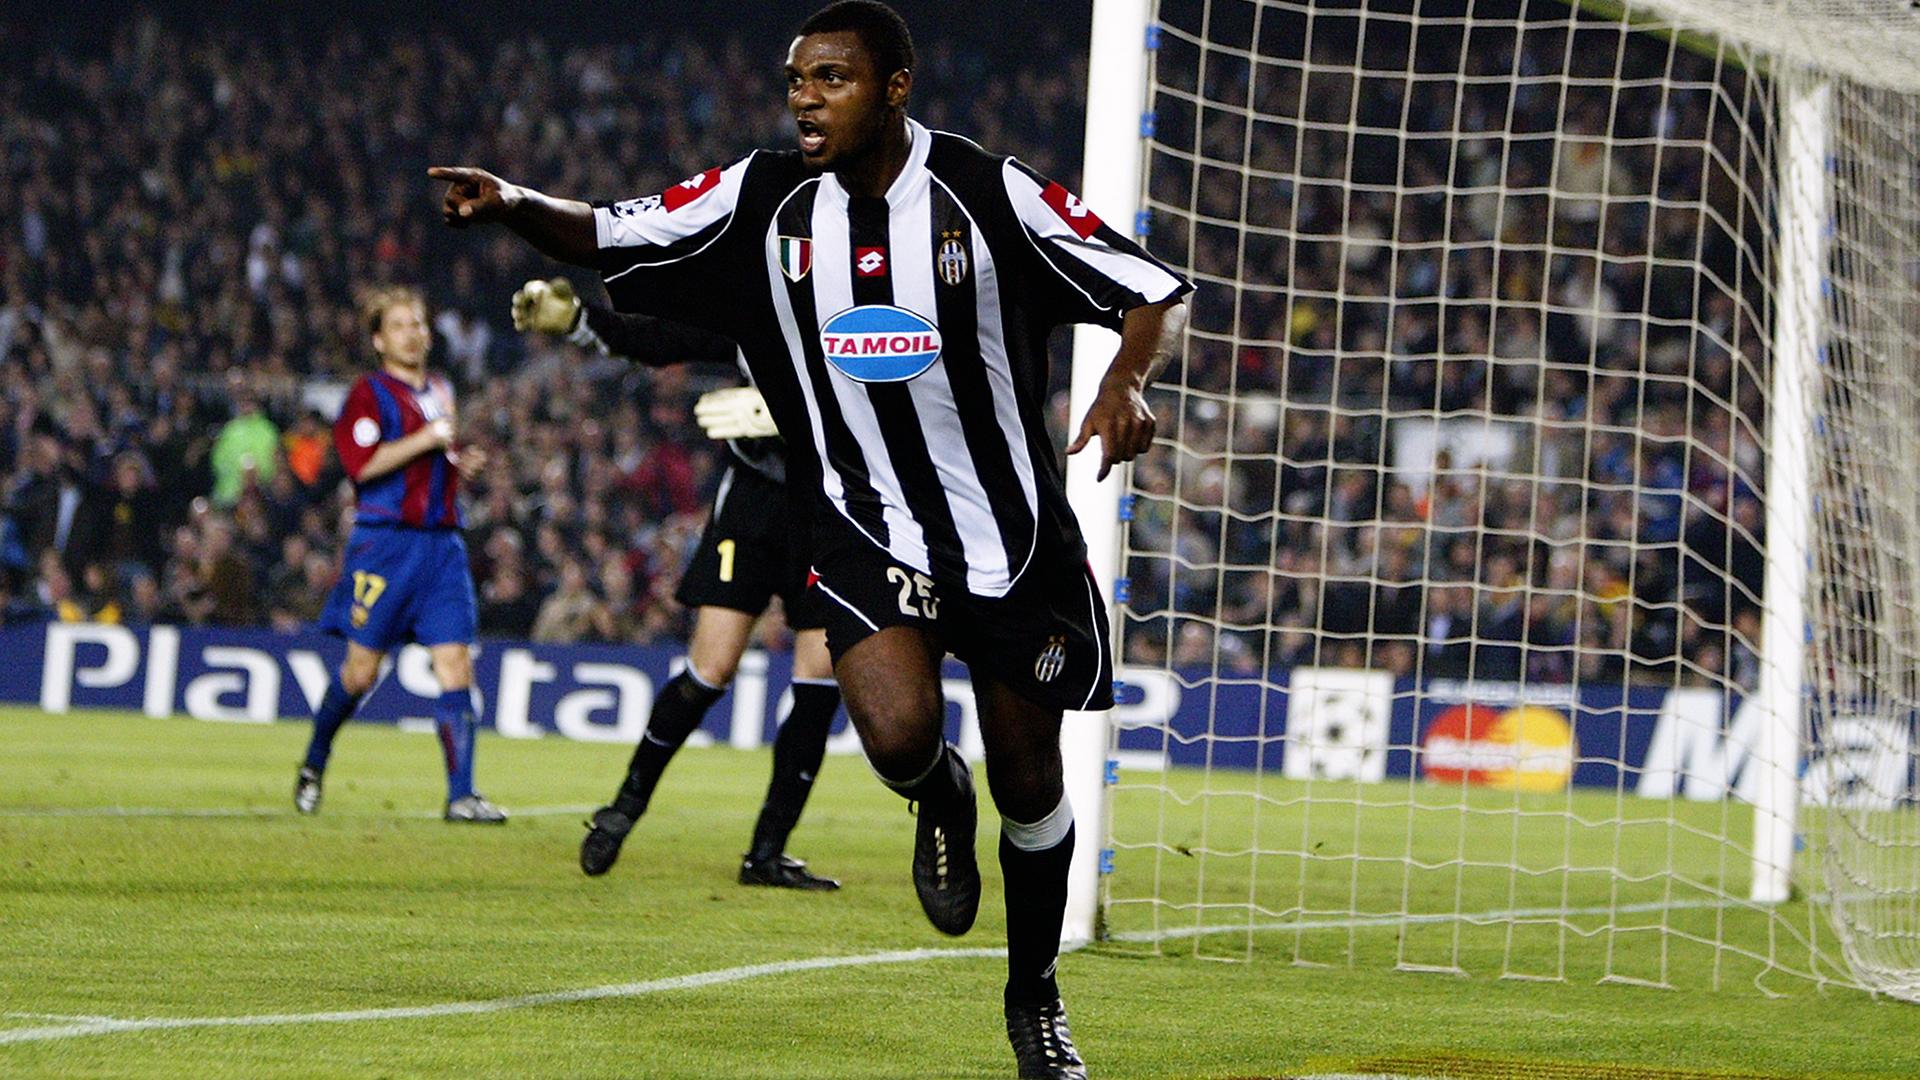 Zalayeta Juventus Barcelona 2003